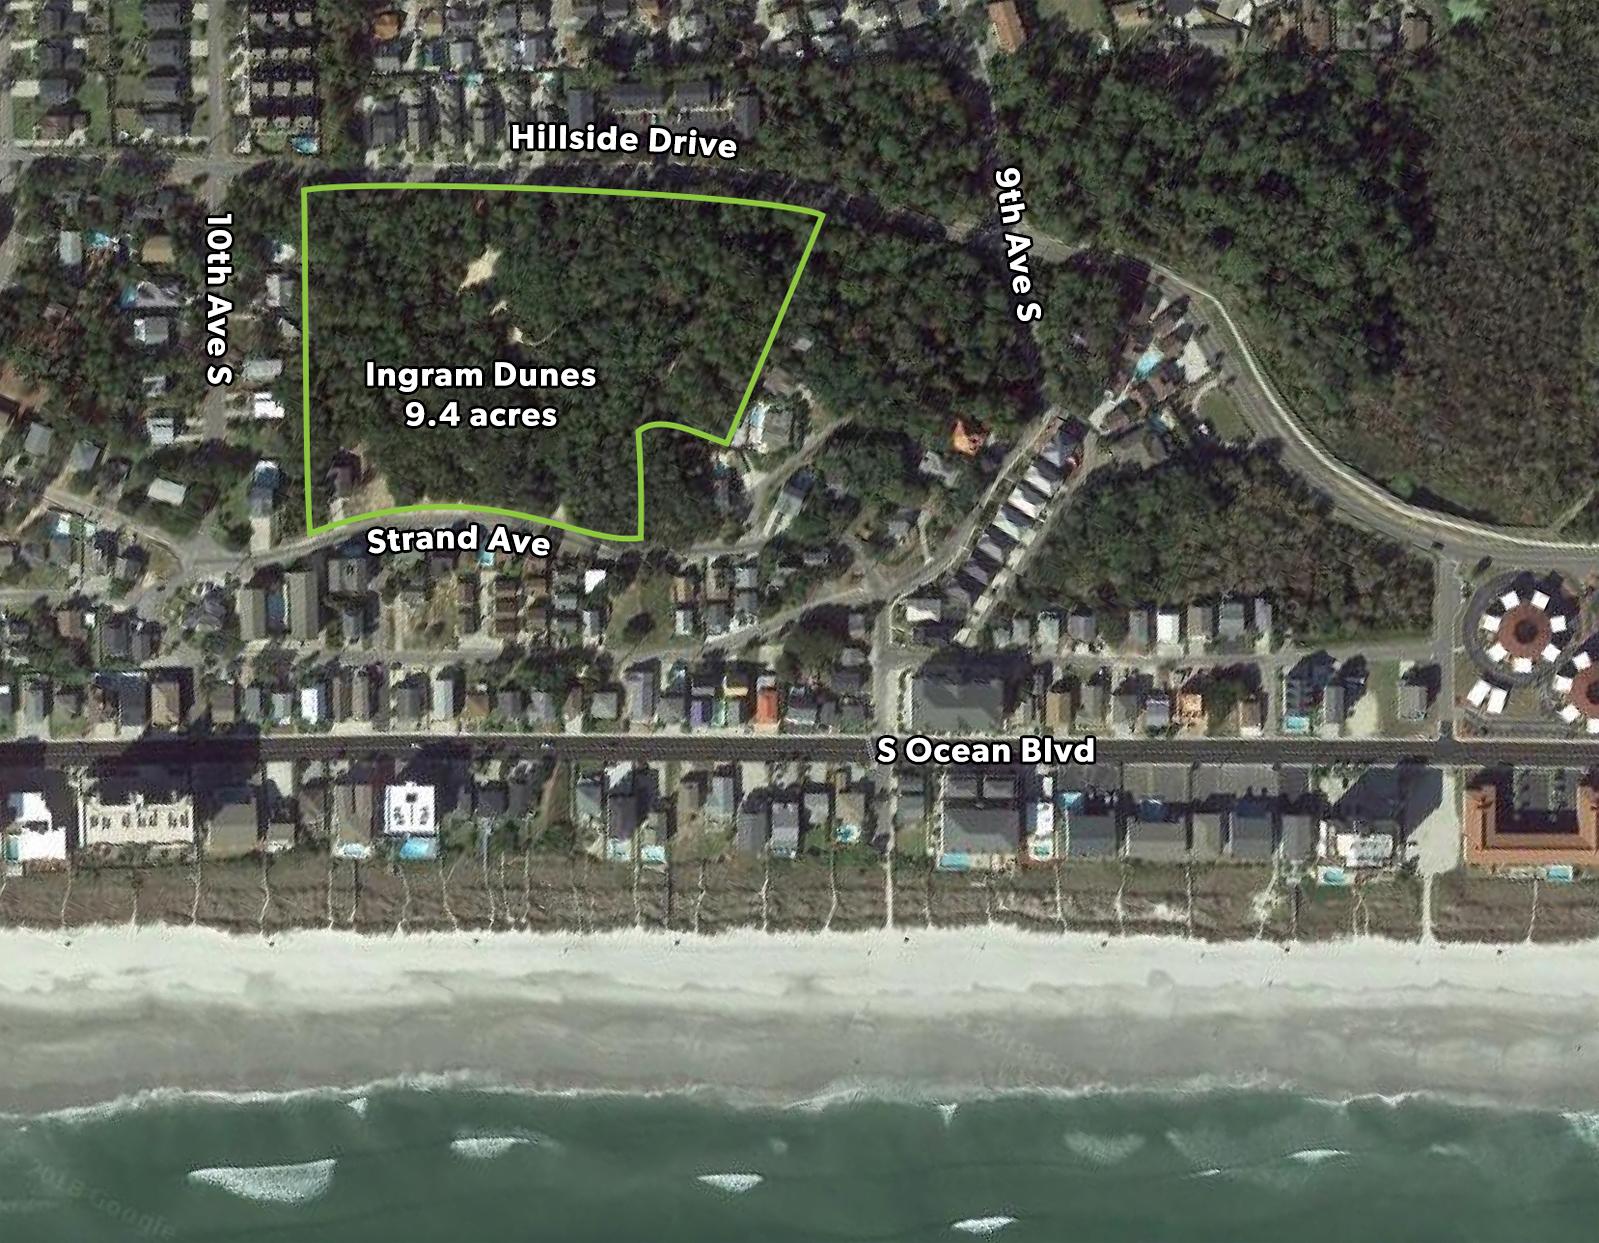 An aerial view of Ingram Dunes in North Myrtle Beach, SC.